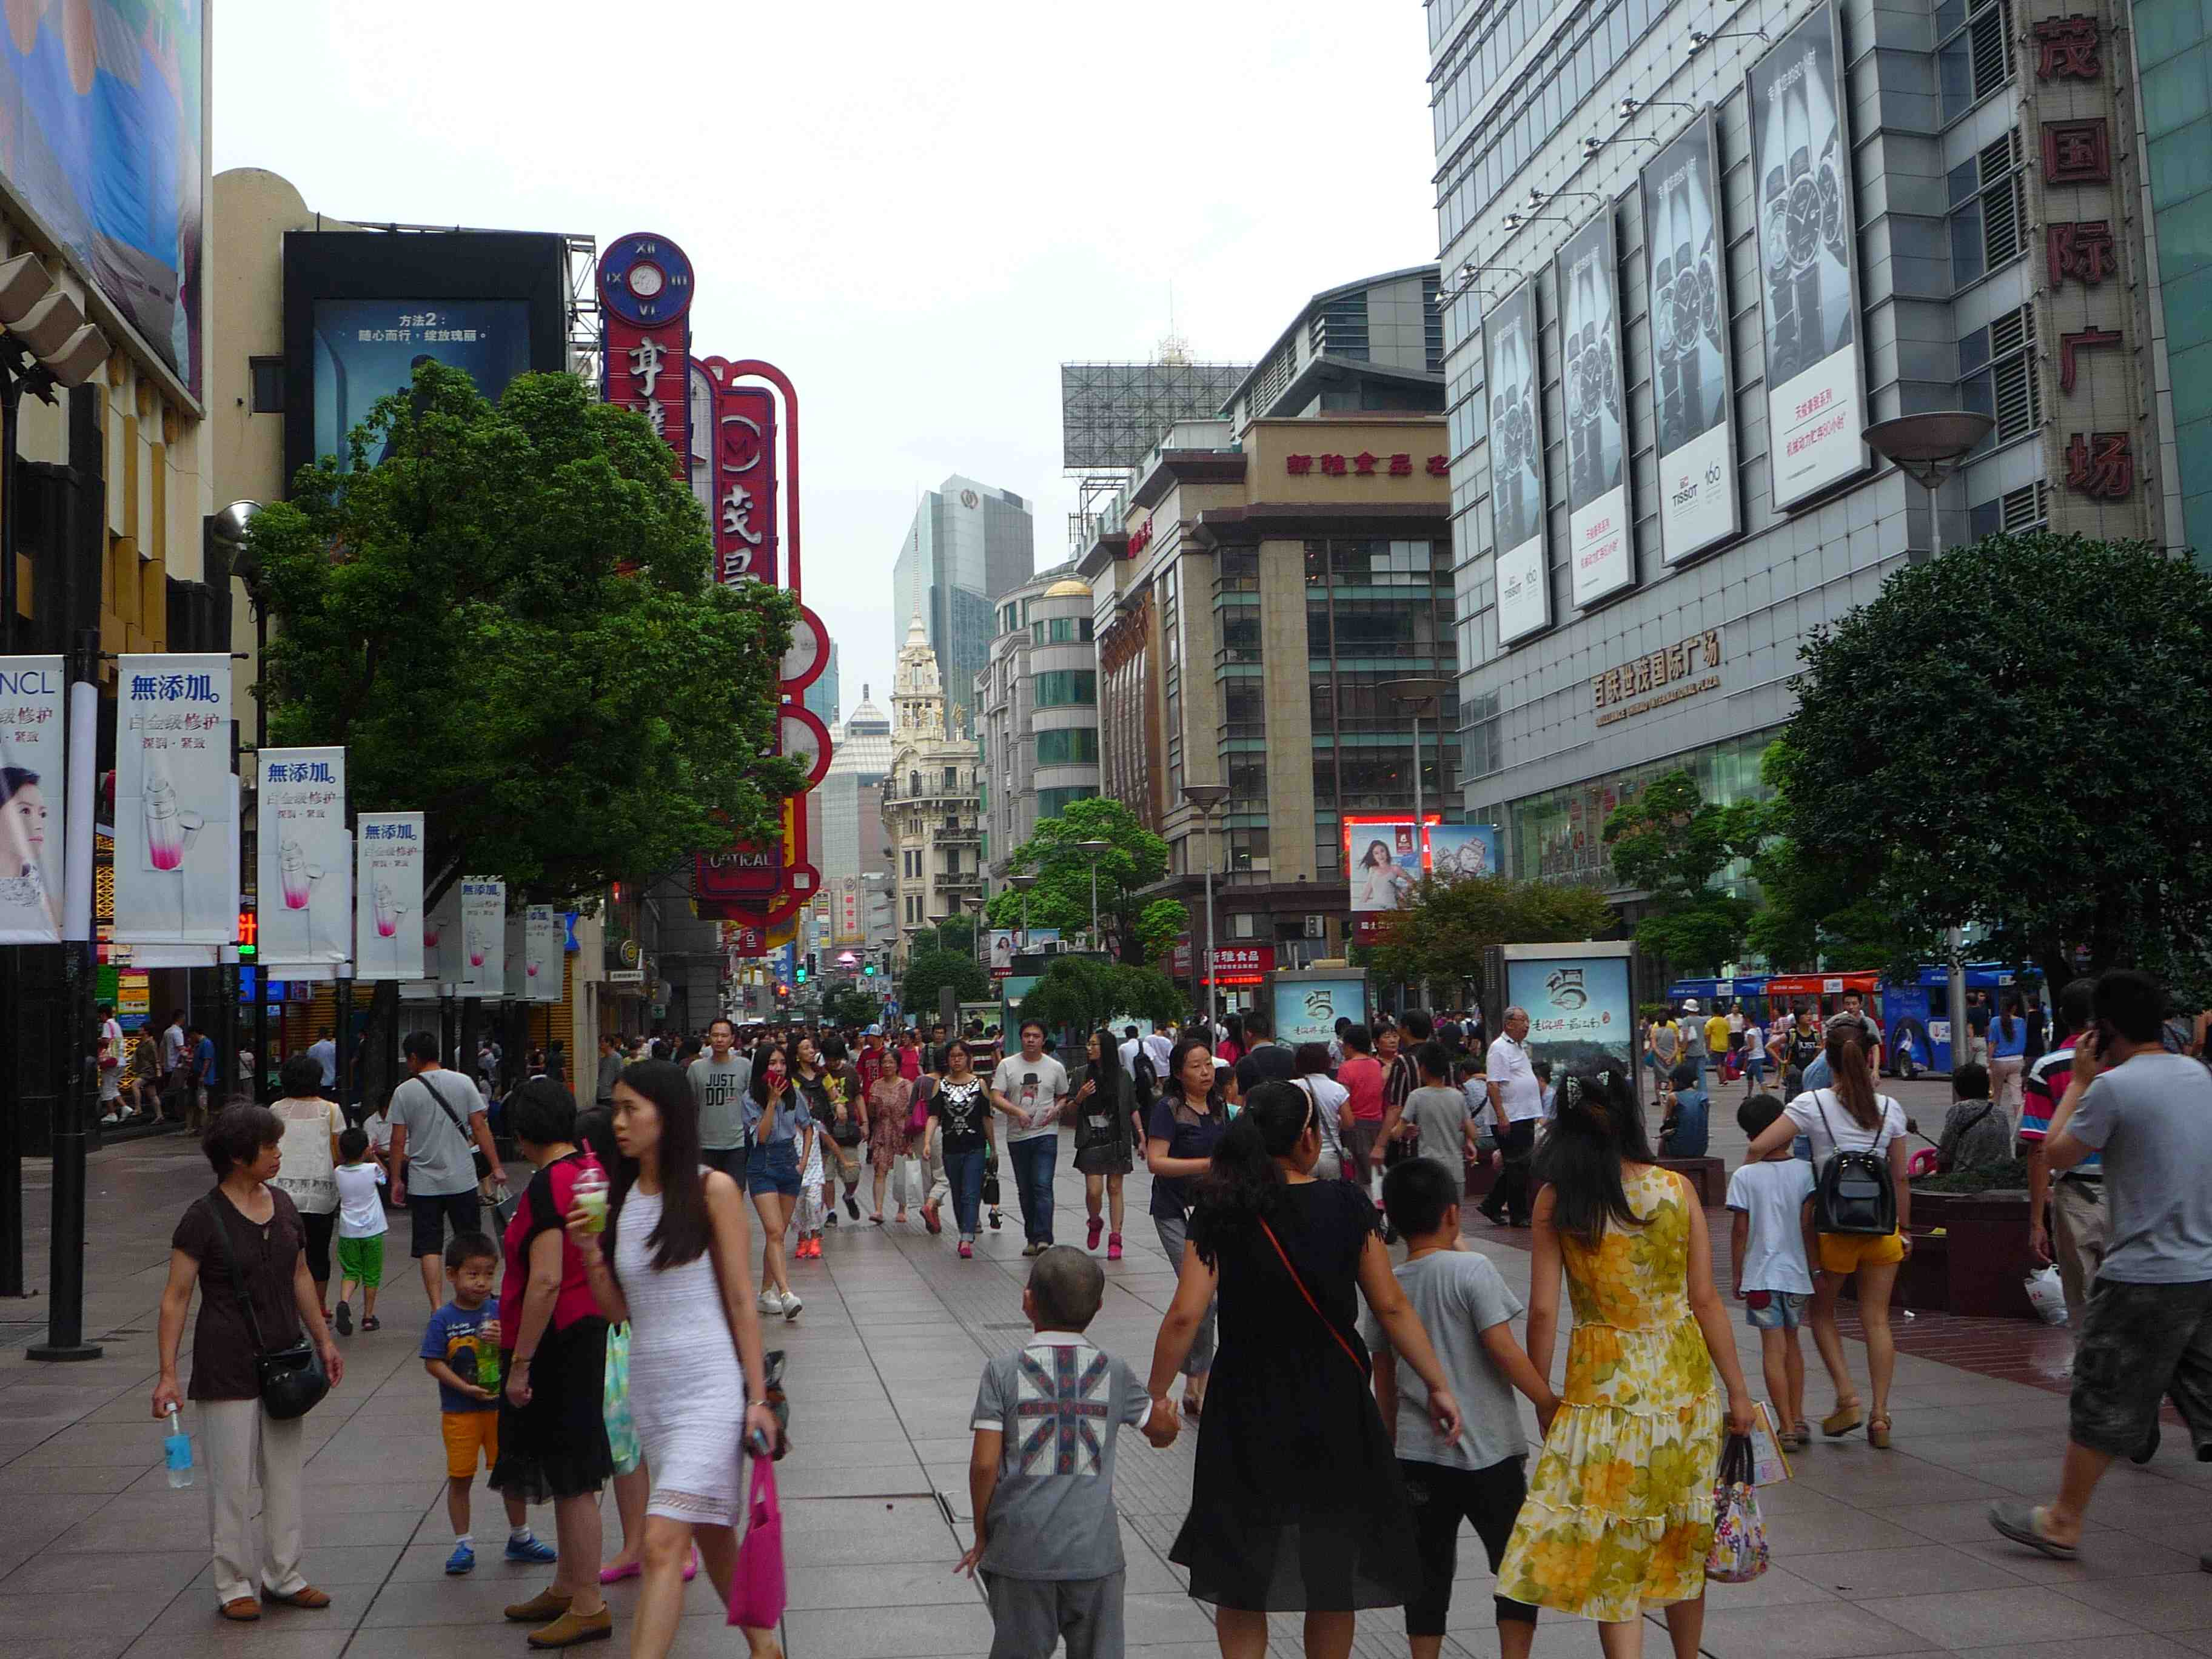 Shanghai_nanjing_lu.jpg